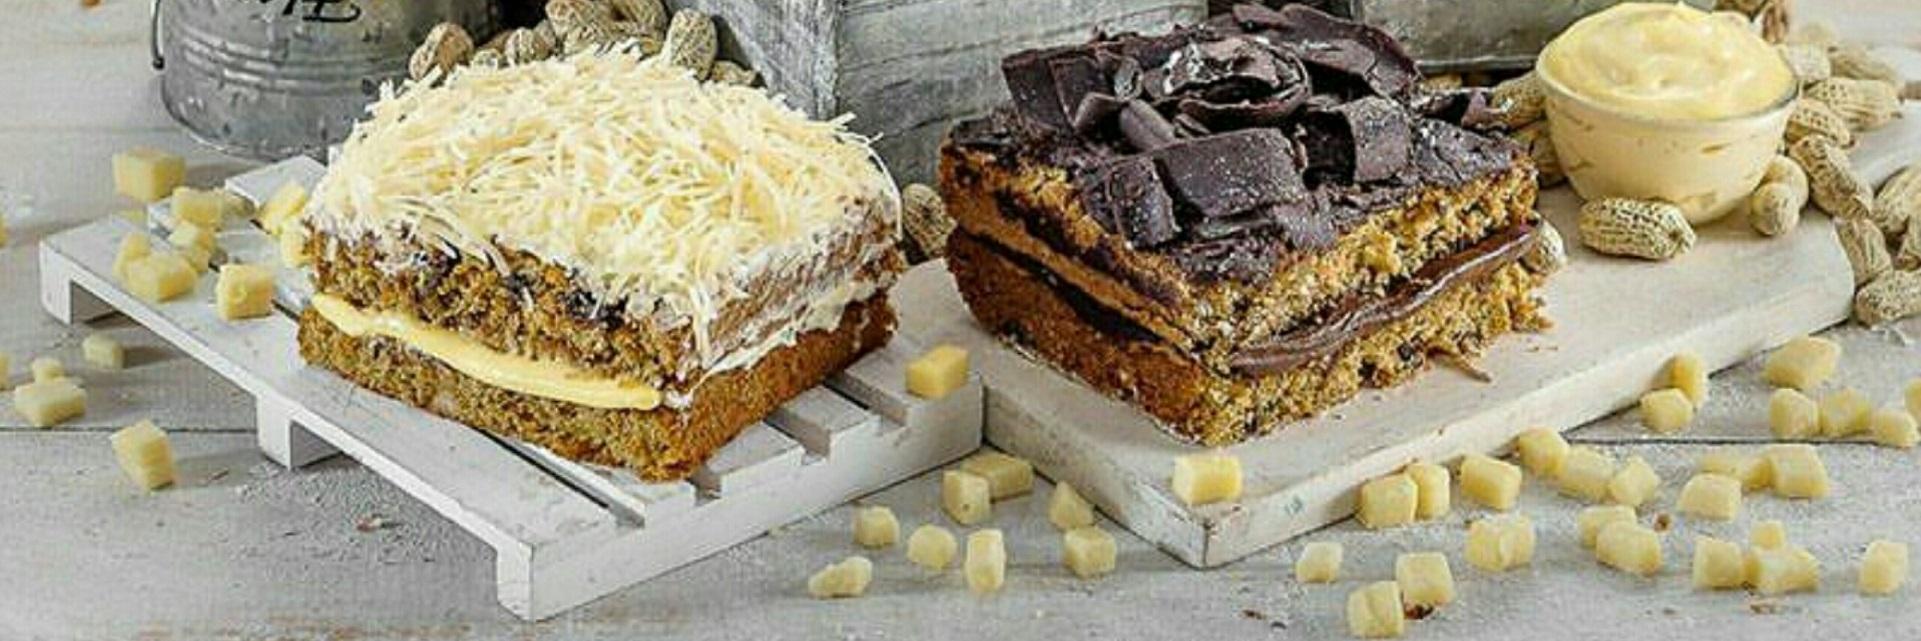 Makobu Cake, Makobu Cake Malang, Malang, Kota Malang, Dolan Dolen, Dolaners Makobu Cake - Dolan Dolen